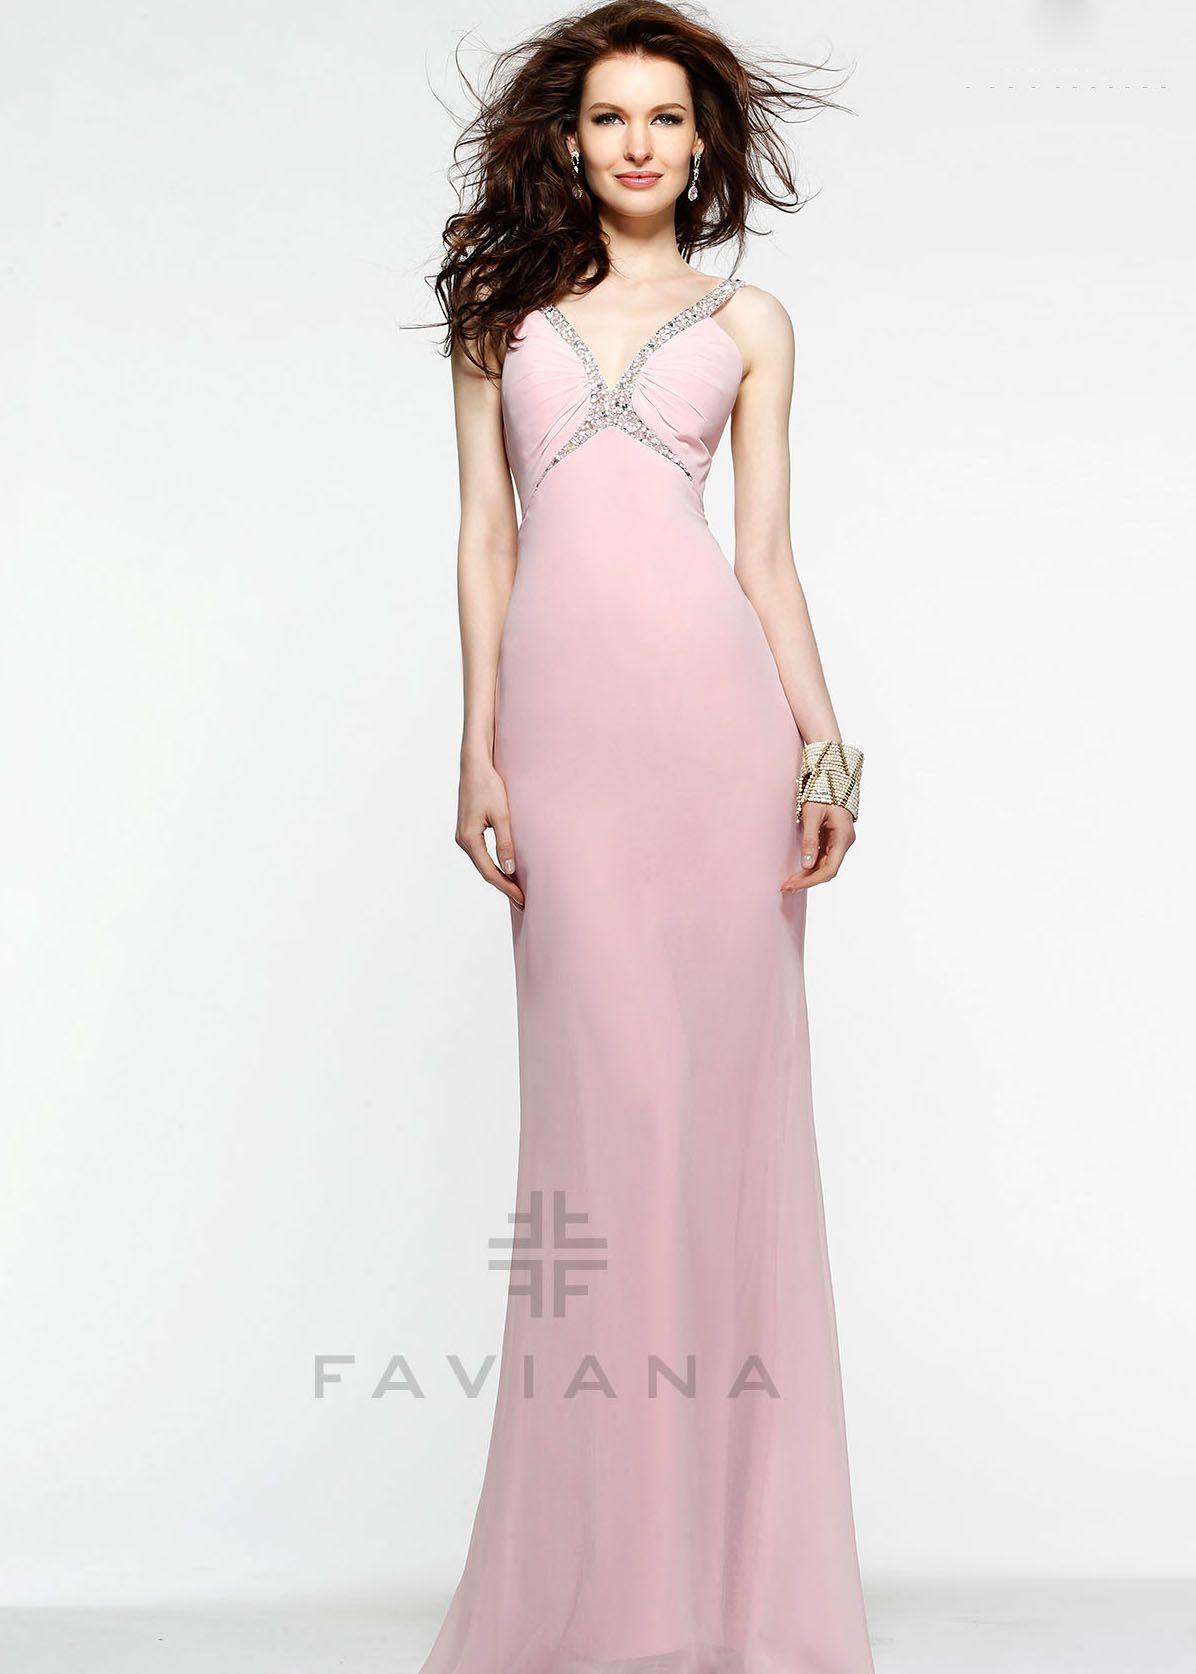 Faviana blush beaded chiffon halter prom dresses online